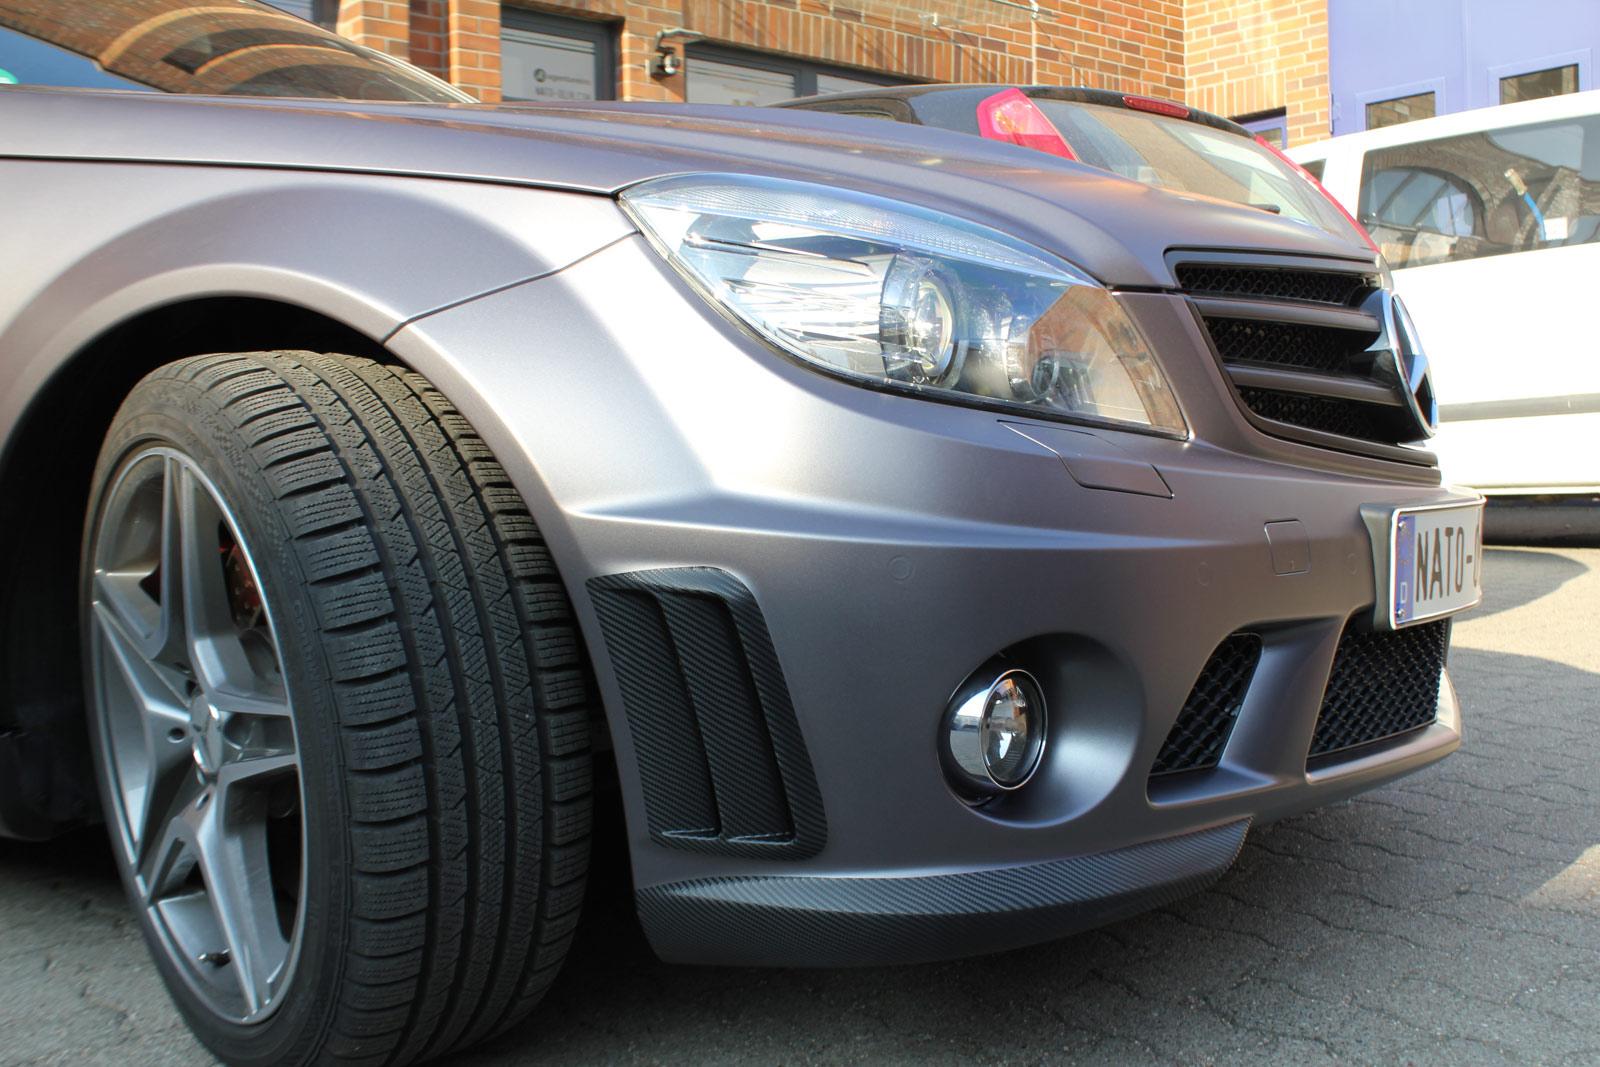 Mercedes_C63_AMG_Folierung_Anthrazit_Matt_Metallic_04